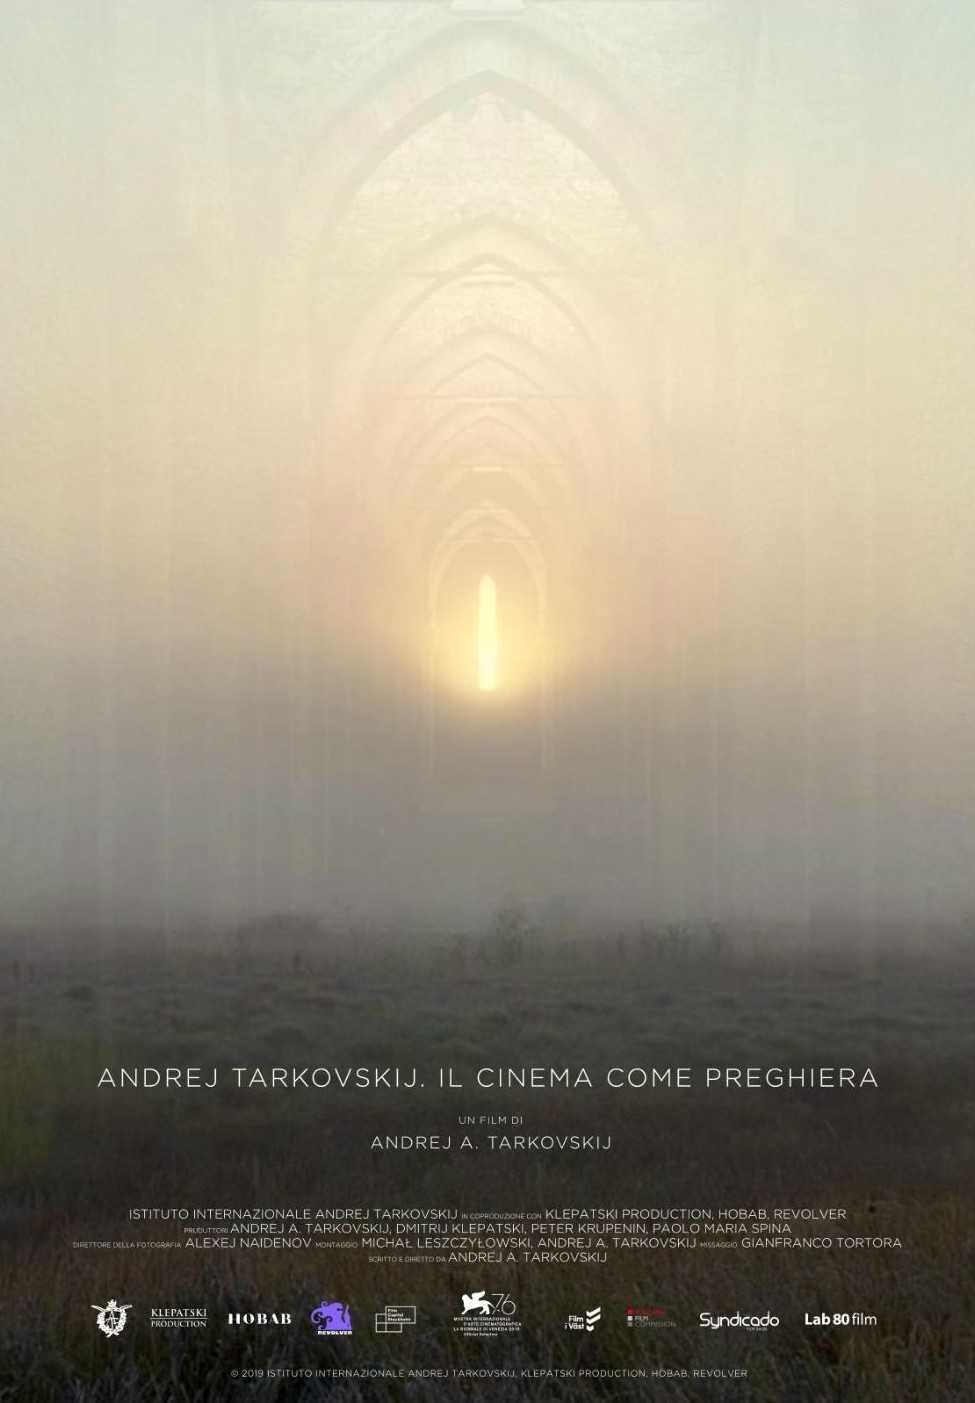 Recensione Andrej Tarkovskij - Il cinema come preghiera   Ravenna Nightmare Film Fest 2020